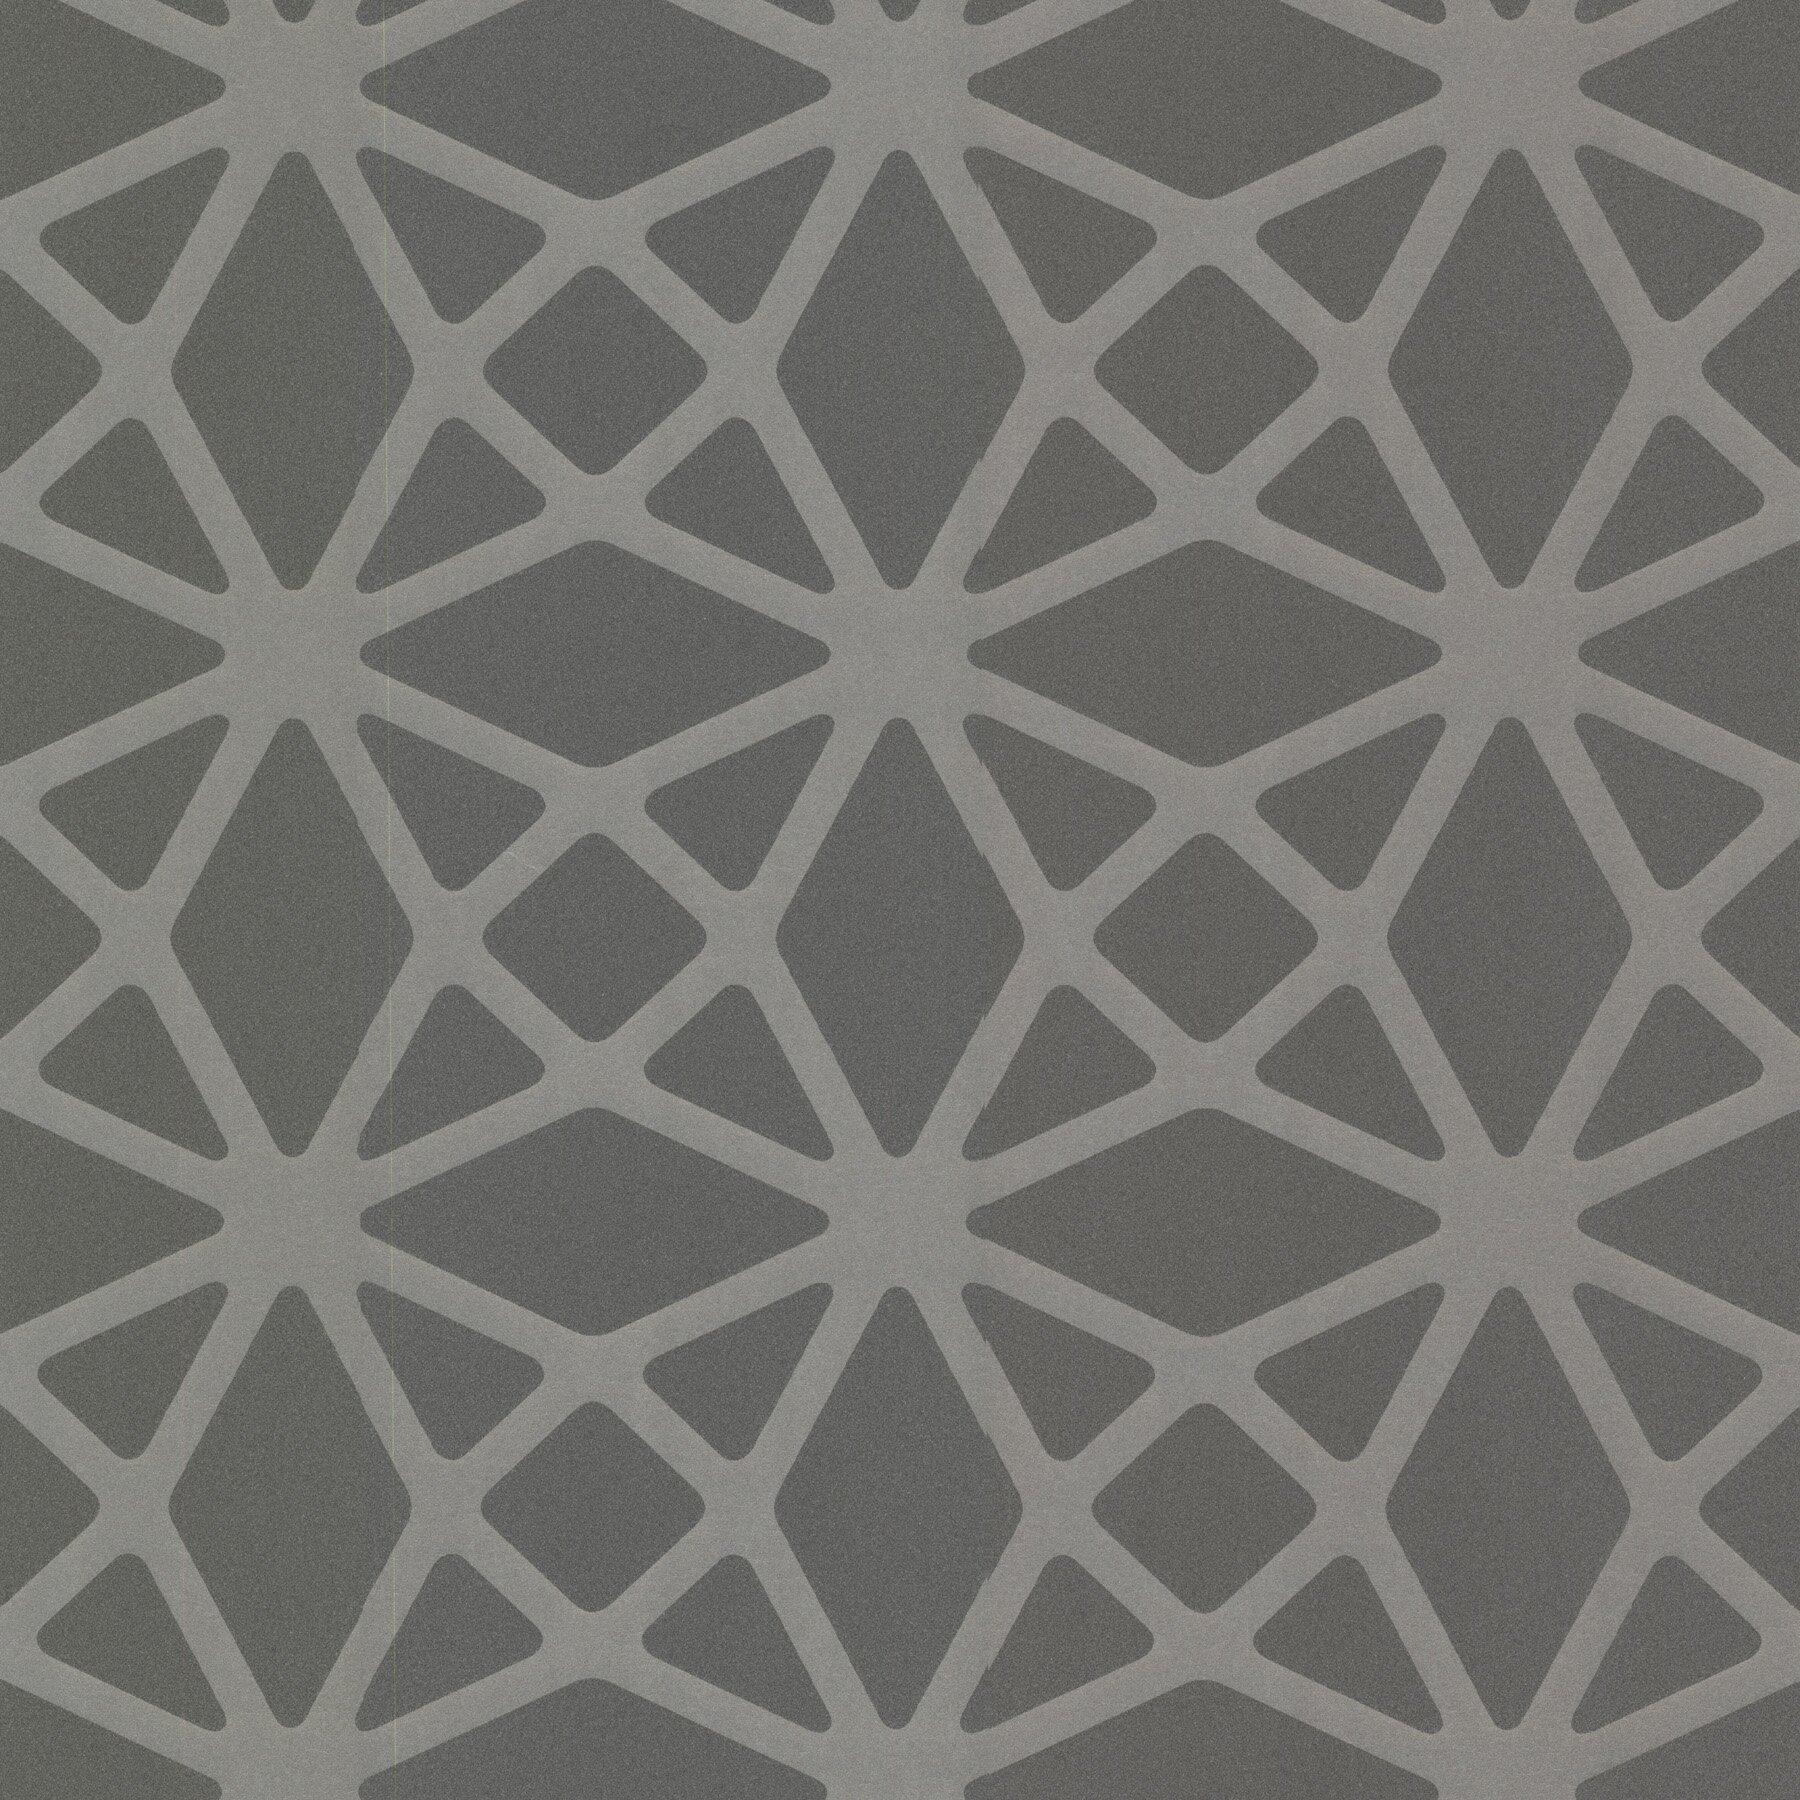 Lattice Wallpaper: Brewster Home Fashions Geo Enterprise Lattice Geometric